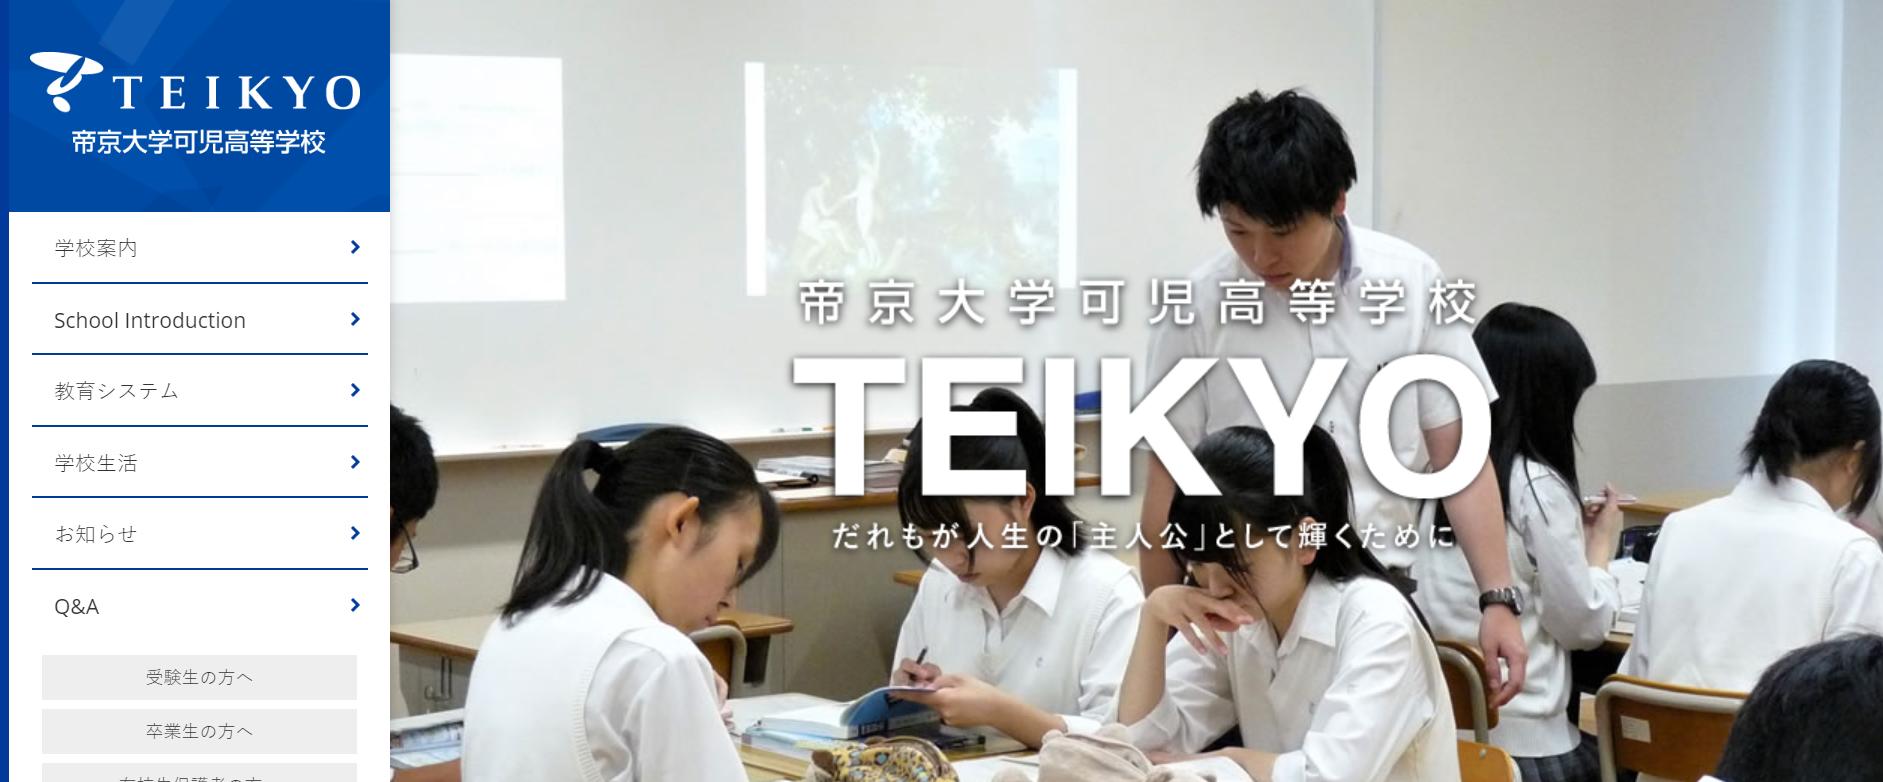 帝京大学可児高校の口コミ・評判